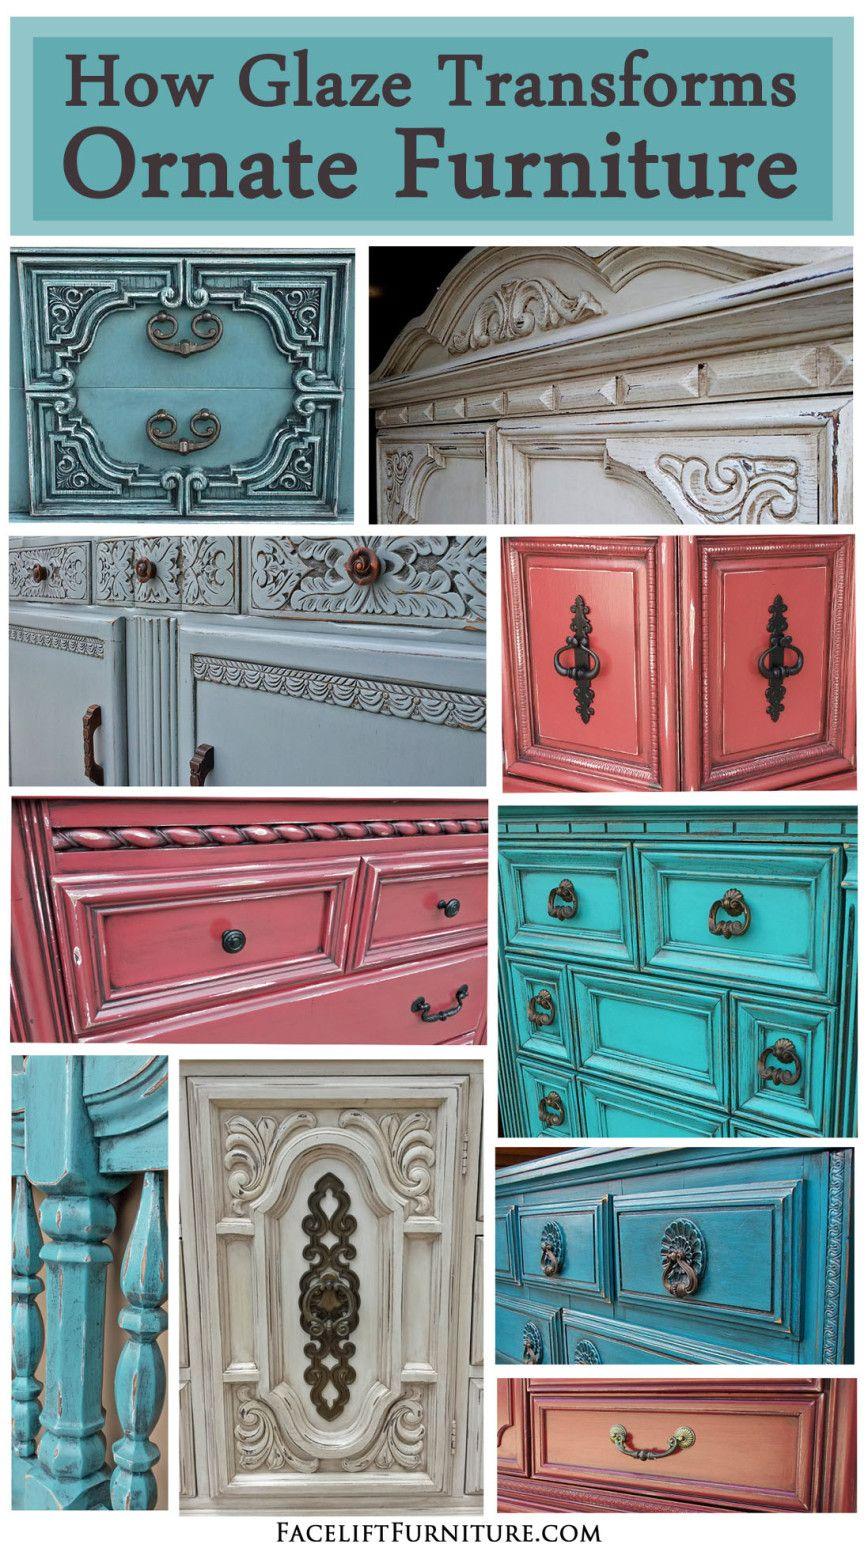 How Glaze Transforms Ornate Furniture - Facelift Furniture - How Glaze Transforms Ornate Furniture Glaze